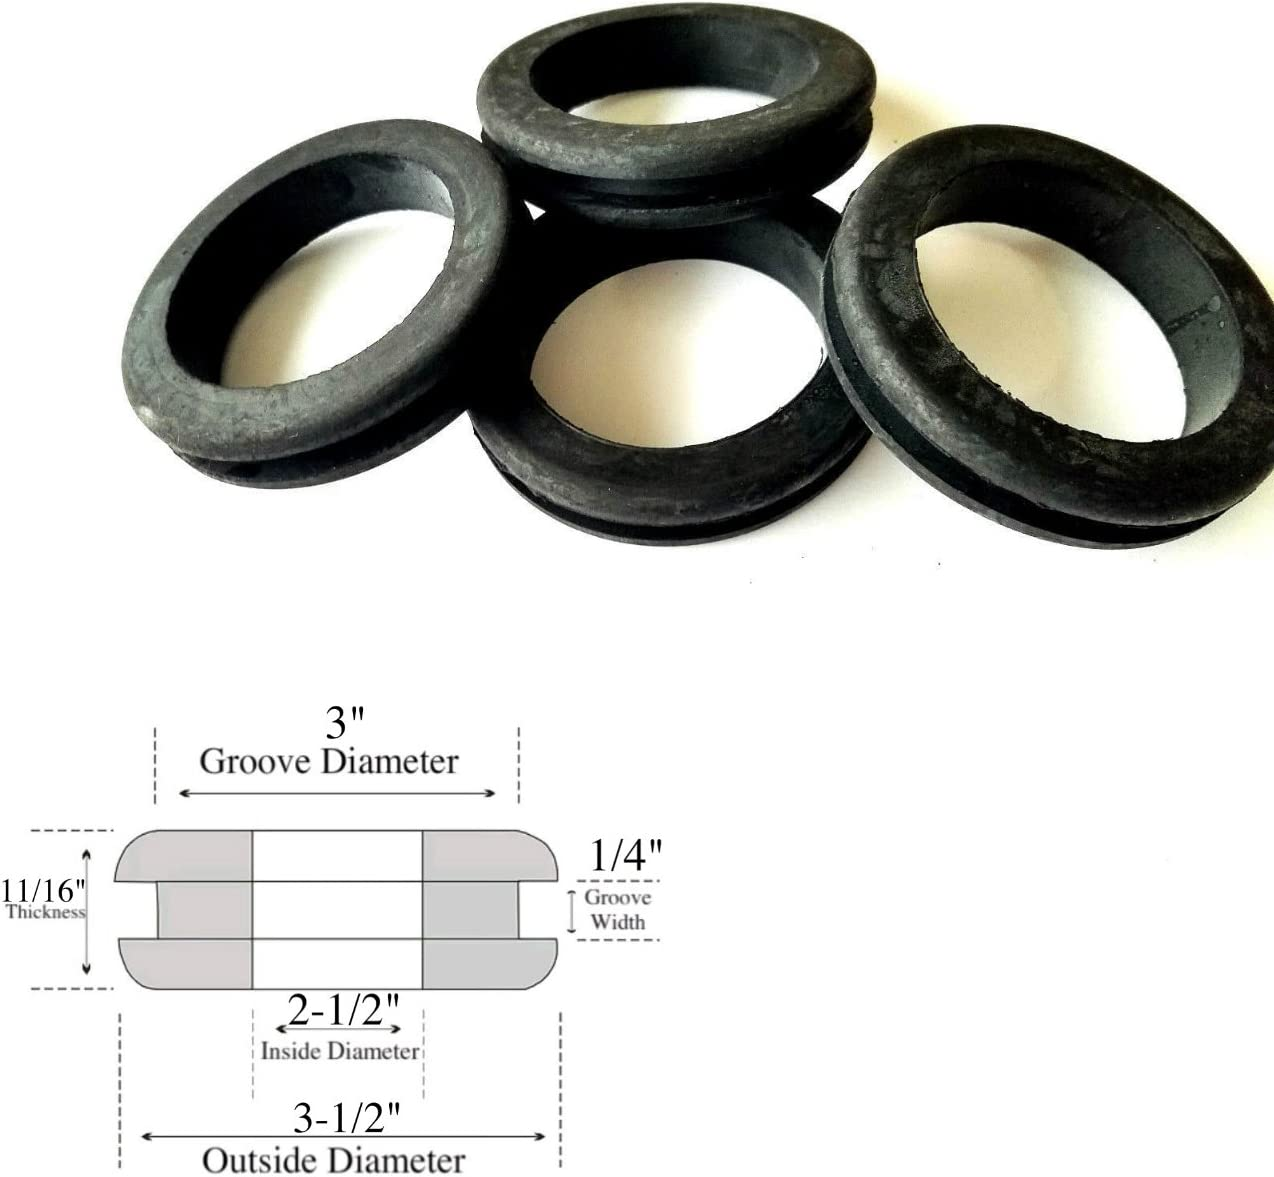 Fits 1-3//4 Panel Hole Lot of 24 Rubber Grommets 1-1//2 Inside Diameter